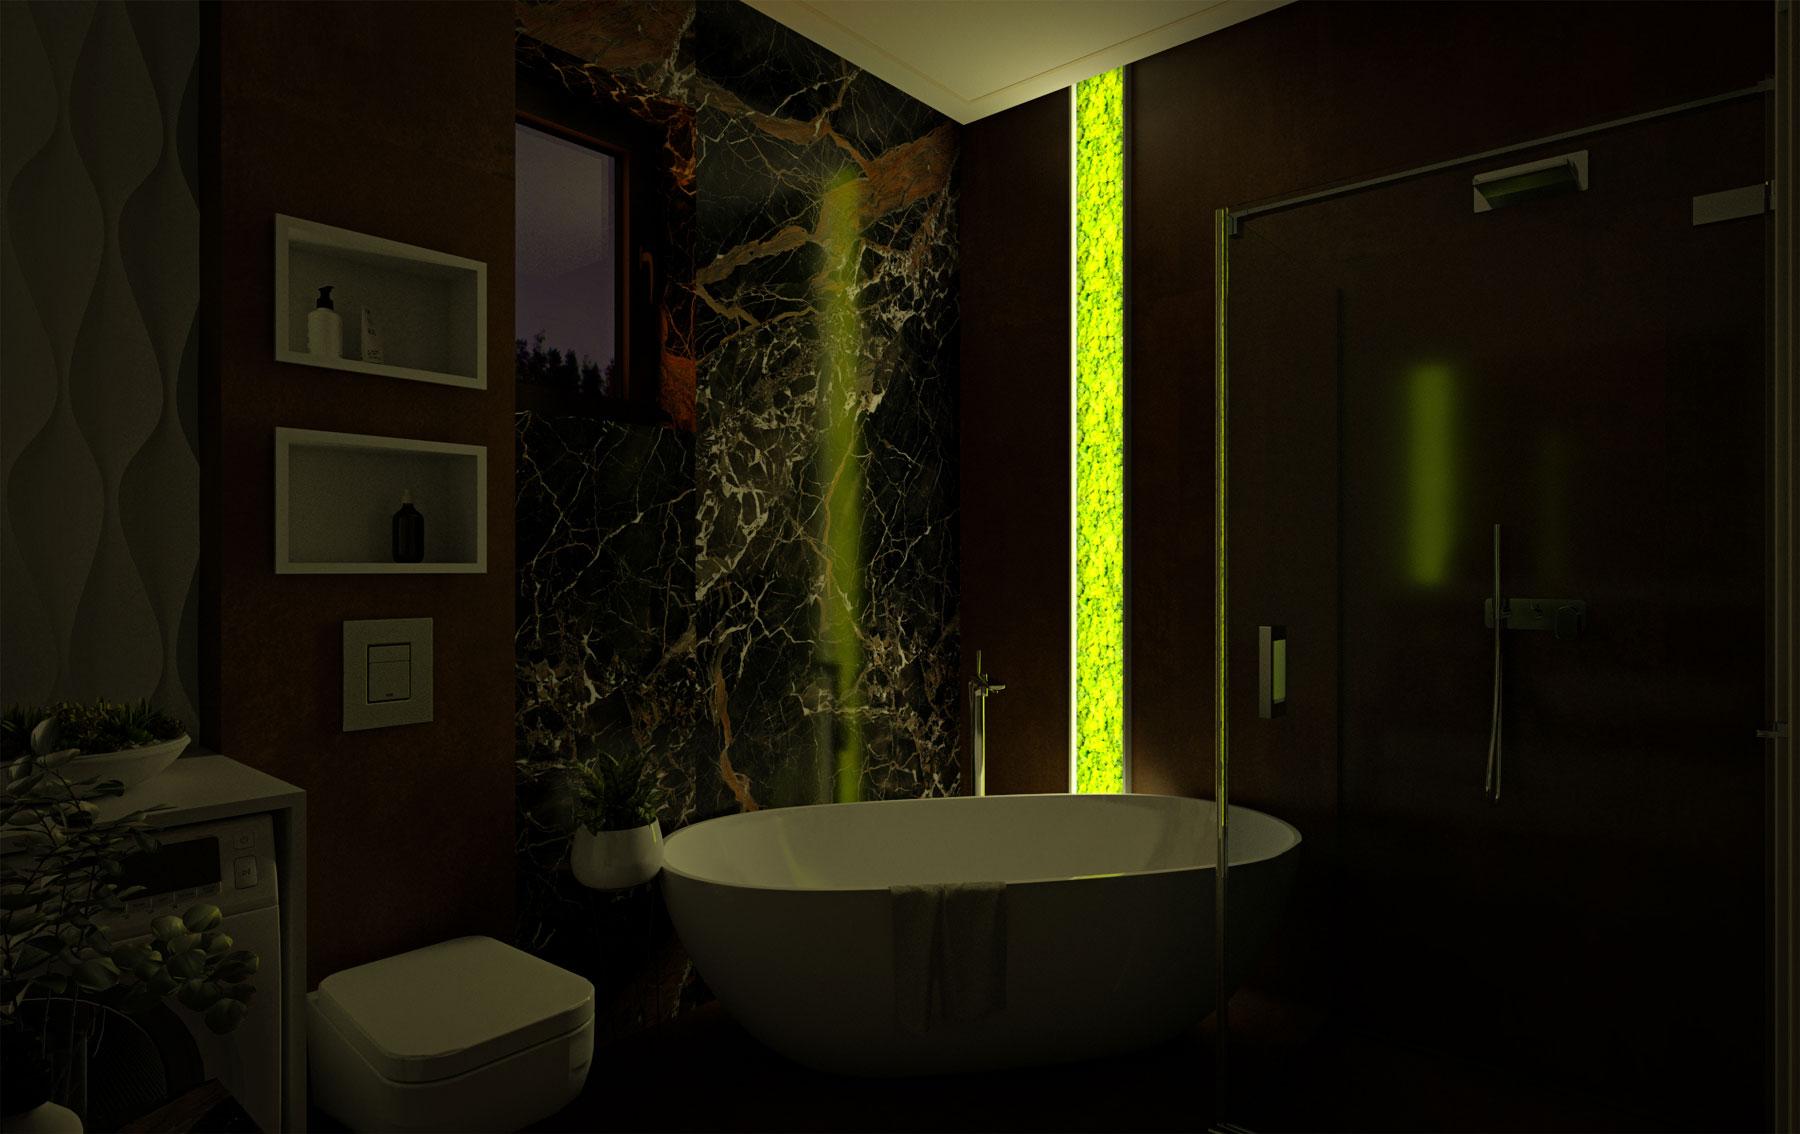 Bathroom scene - Bitopia Falticeni 3D rendering studio